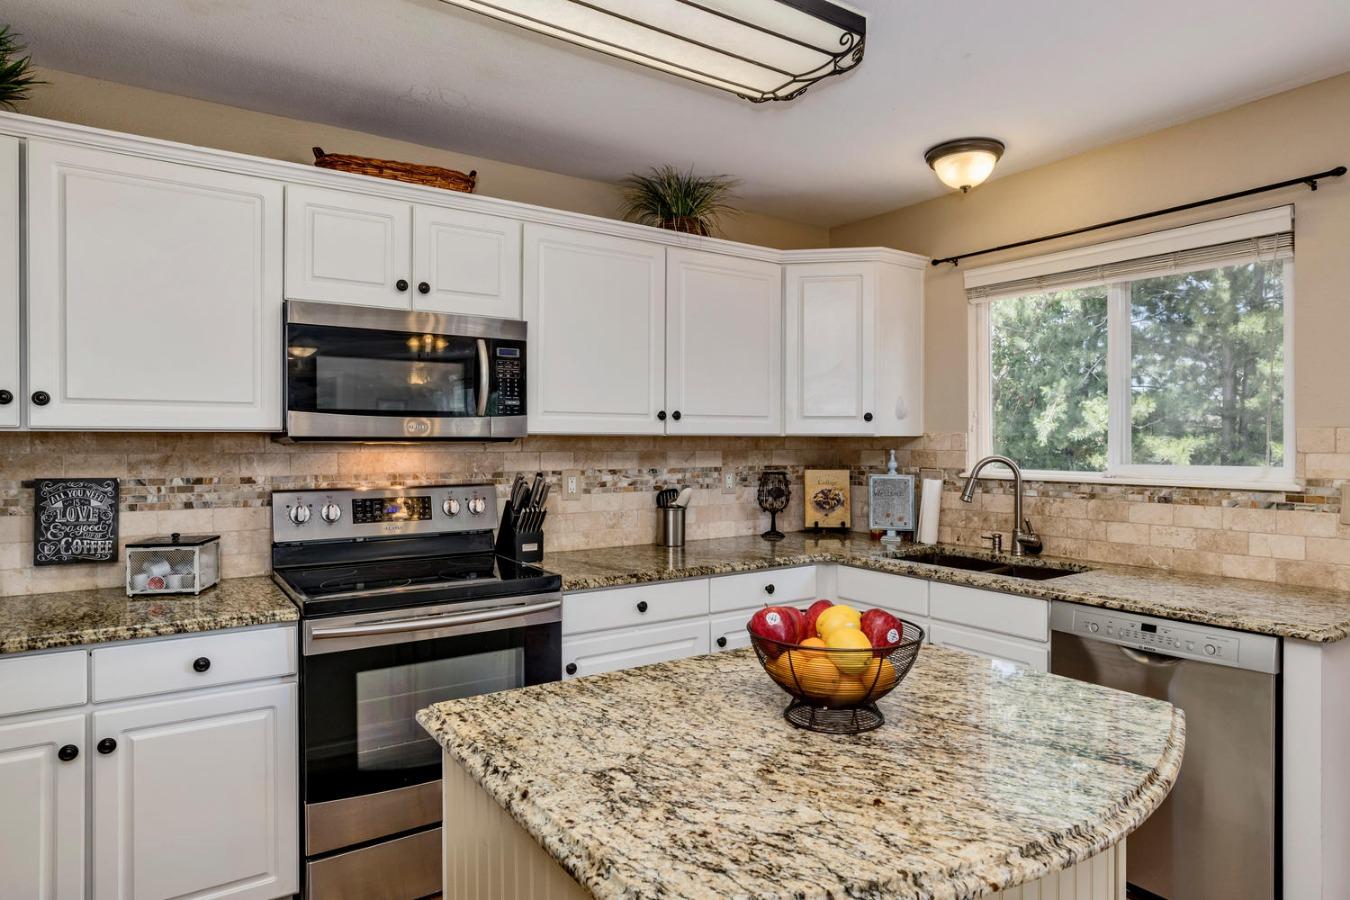 Stainless Appliances & Granite Kitchen